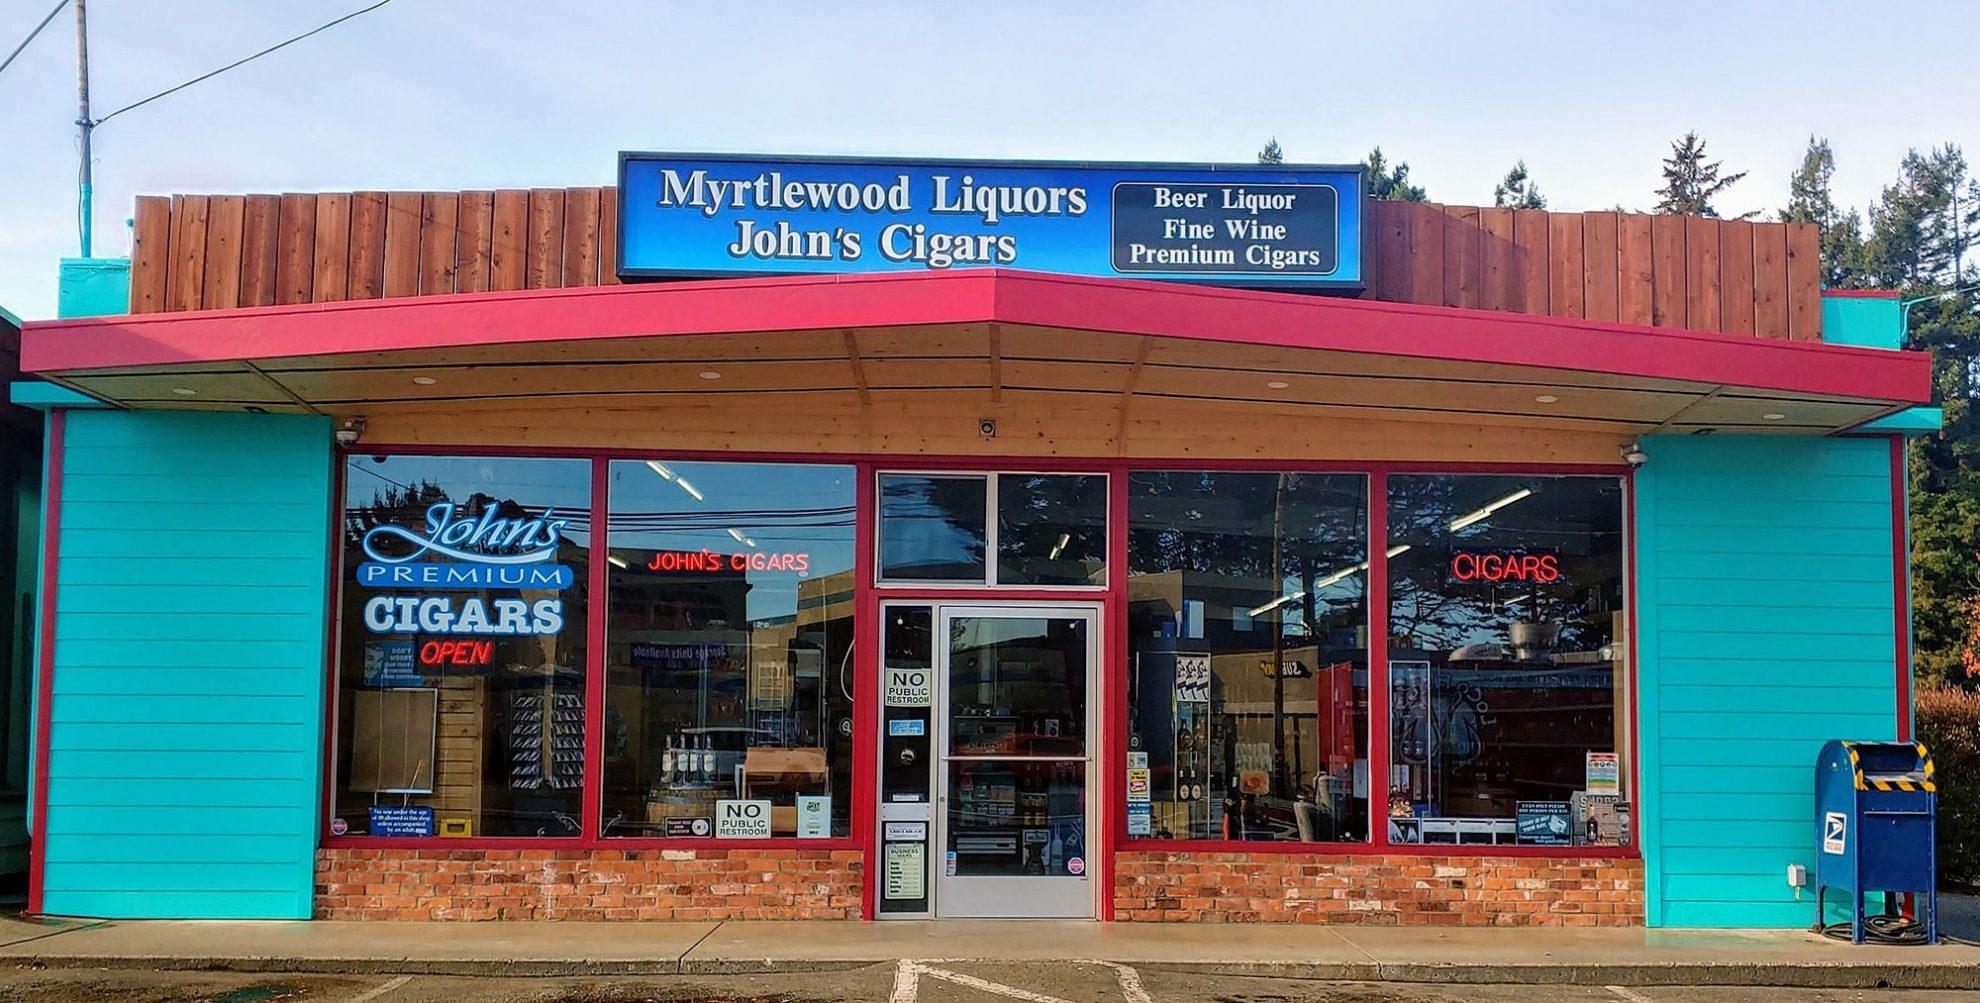 myrtlewood liquors storefront in eureka, ca